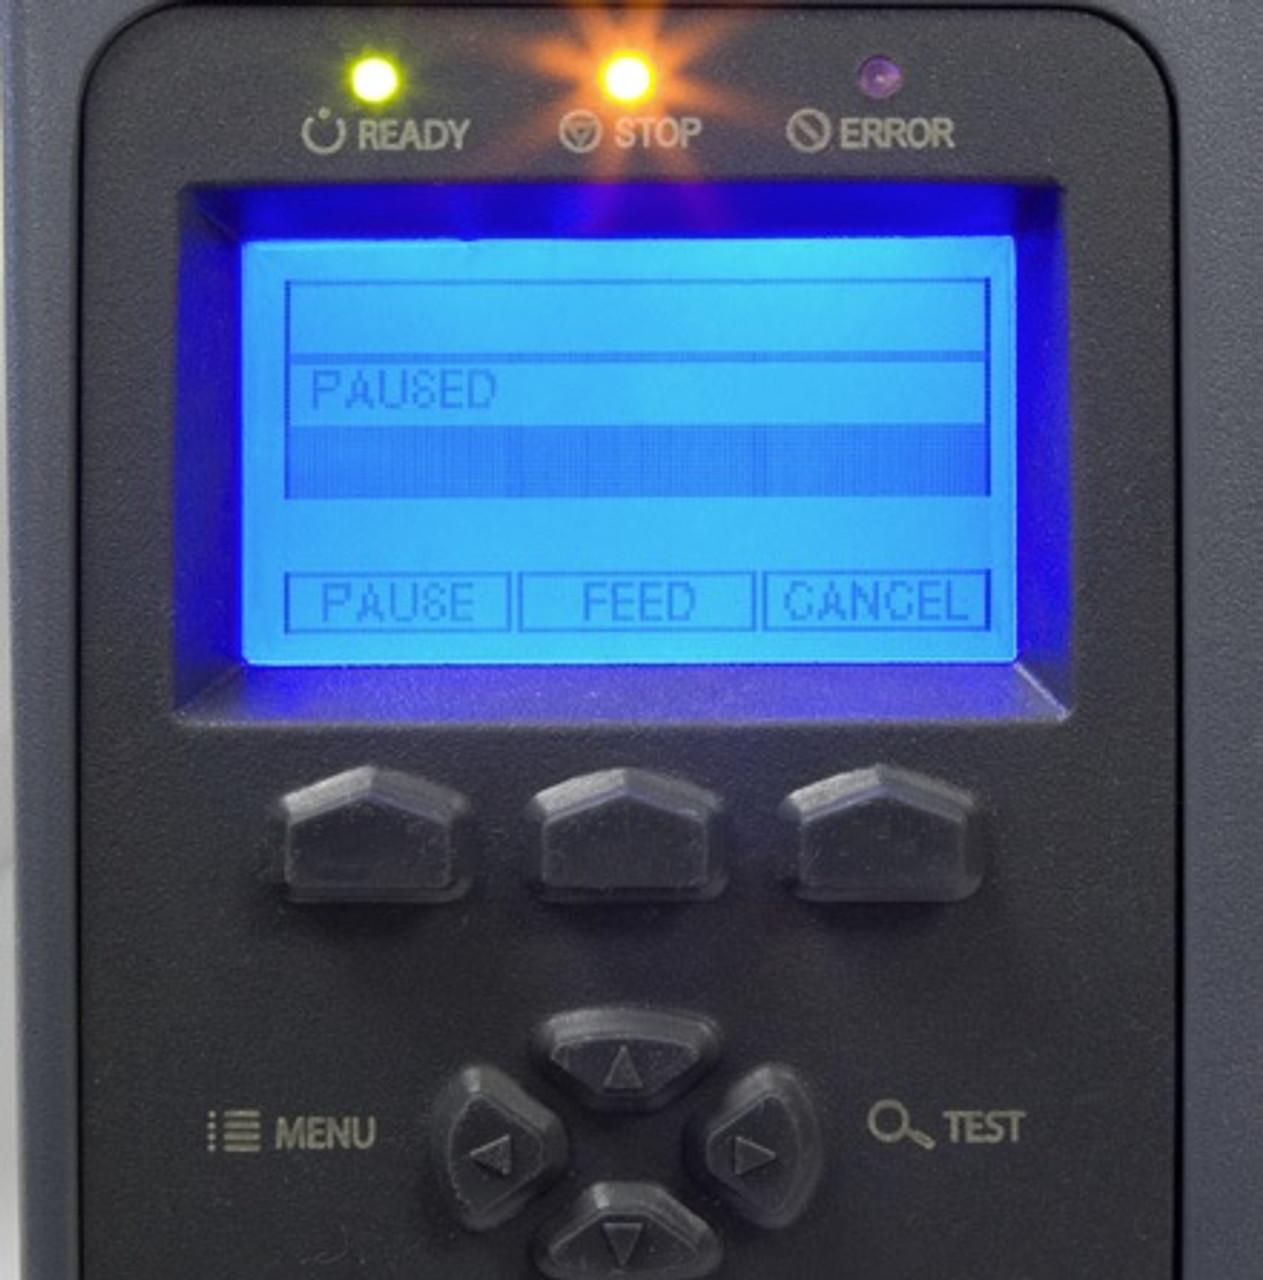 Mettler Toledo APR710 Desktop Direct Thermal/Thermal Transfer Label Printer